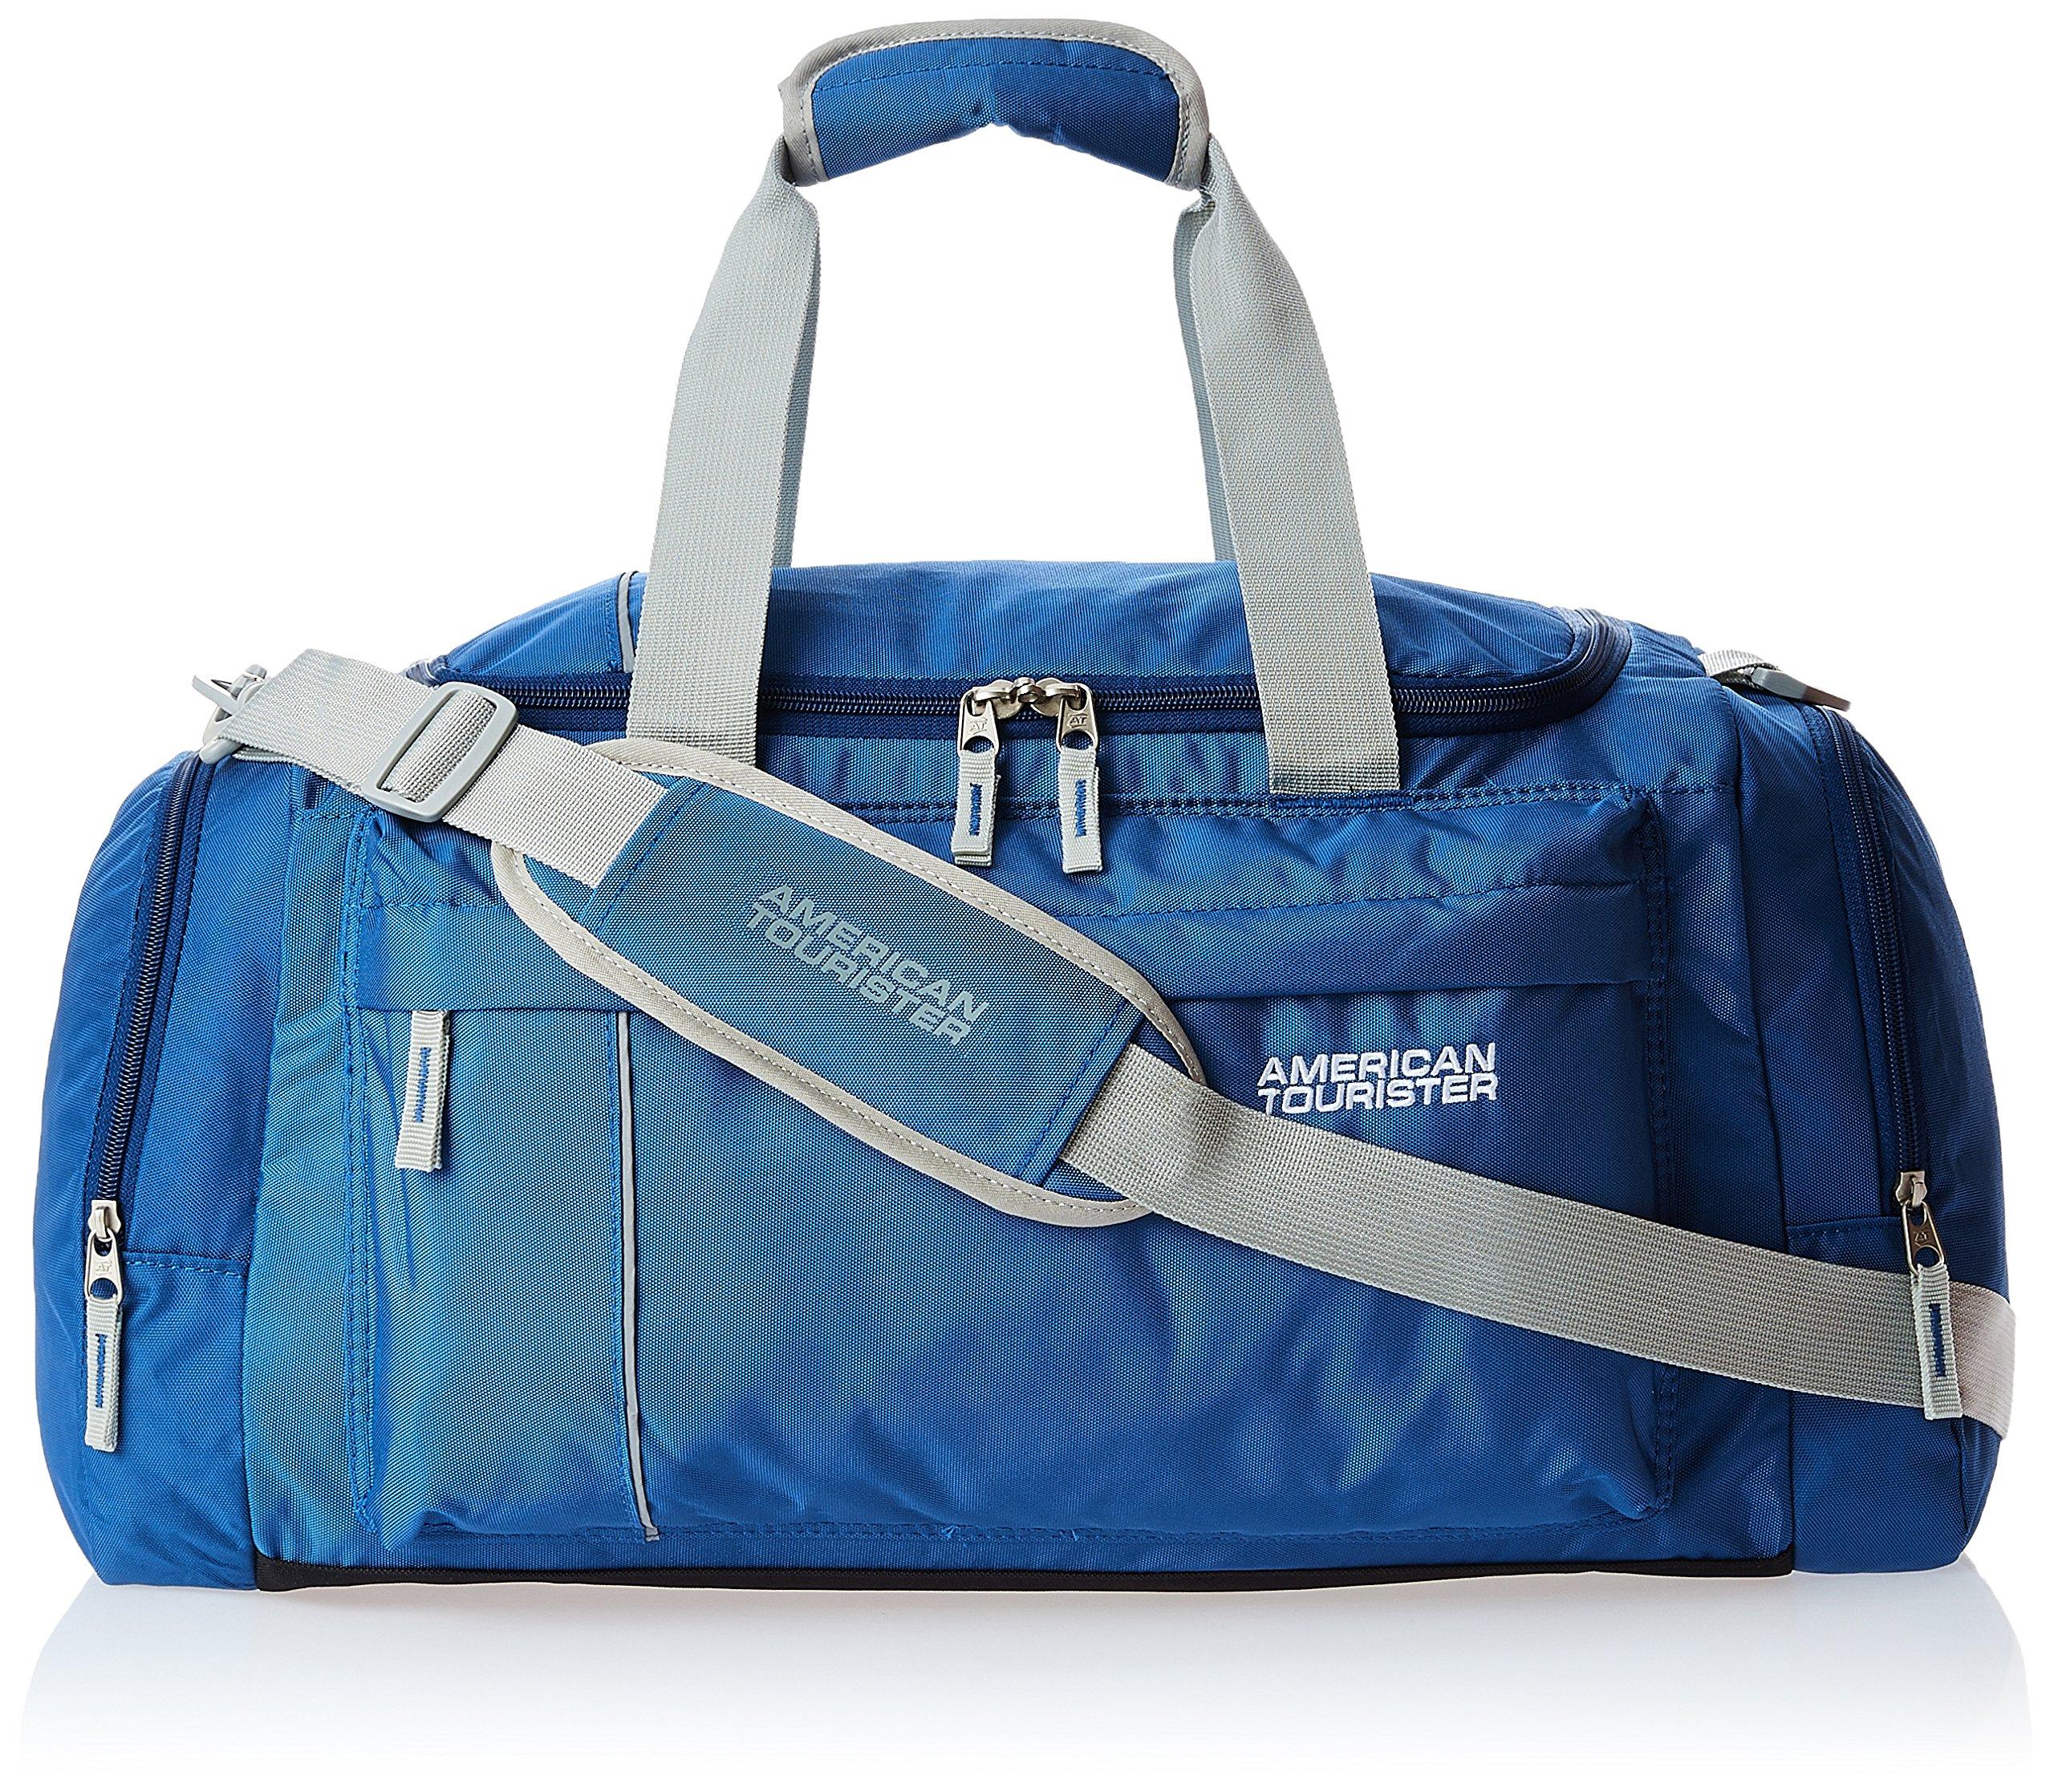 American Tourister Nylon 55 cms Blue Travel Duffle (40X (0) 01 008) product image